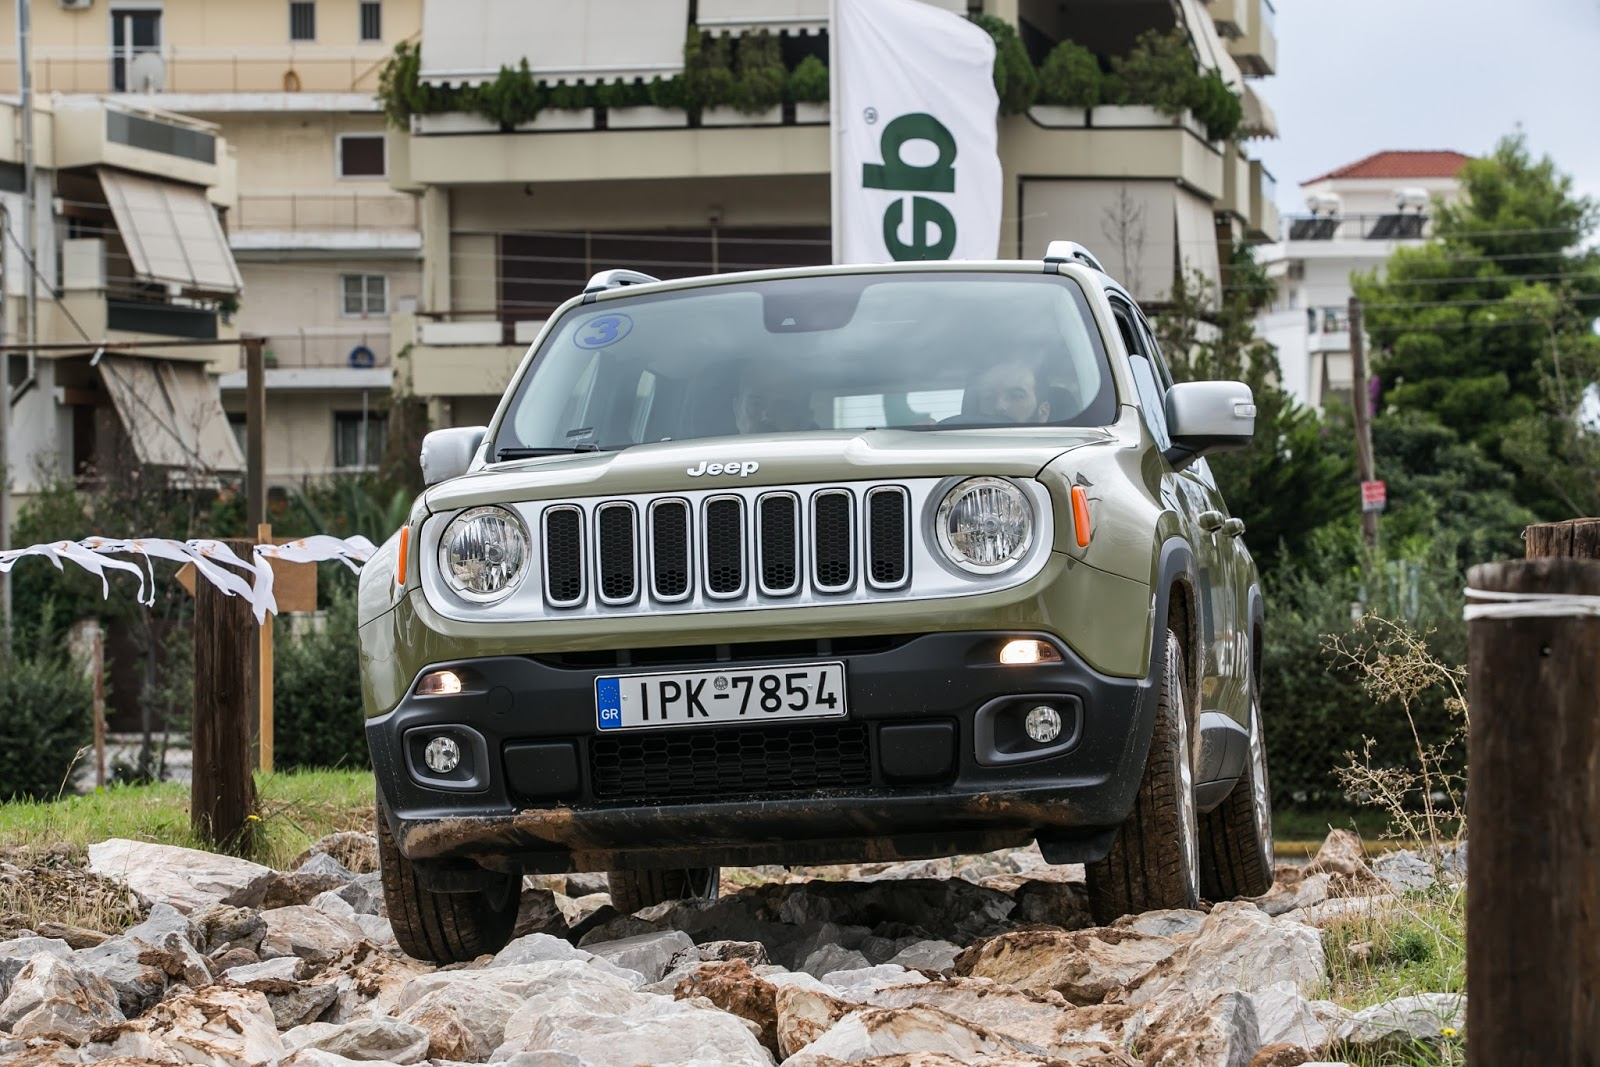 KF 1563 Πετάμε ένα Jeep Renegade σε λάσπες, πέτρες, άμμο, λίμνες. Θα τα καταφέρει; Jeep, Jeep Renegade, Renegade, SUV, TEST, zblog, ΔΟΚΙΜΕΣ